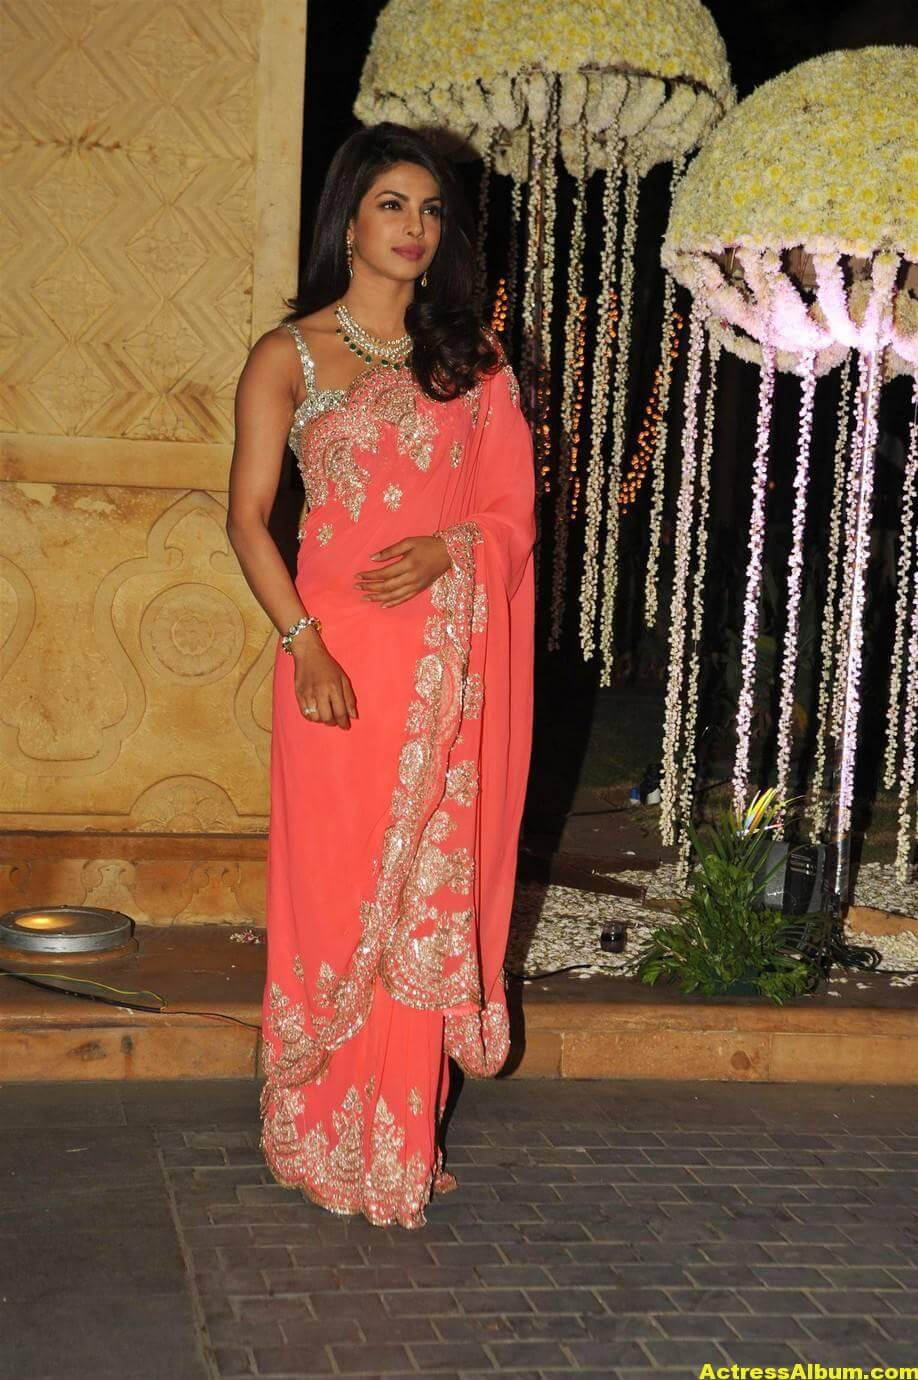 Priyanka Chopra Latest Hot Stills In Pink Saree 1